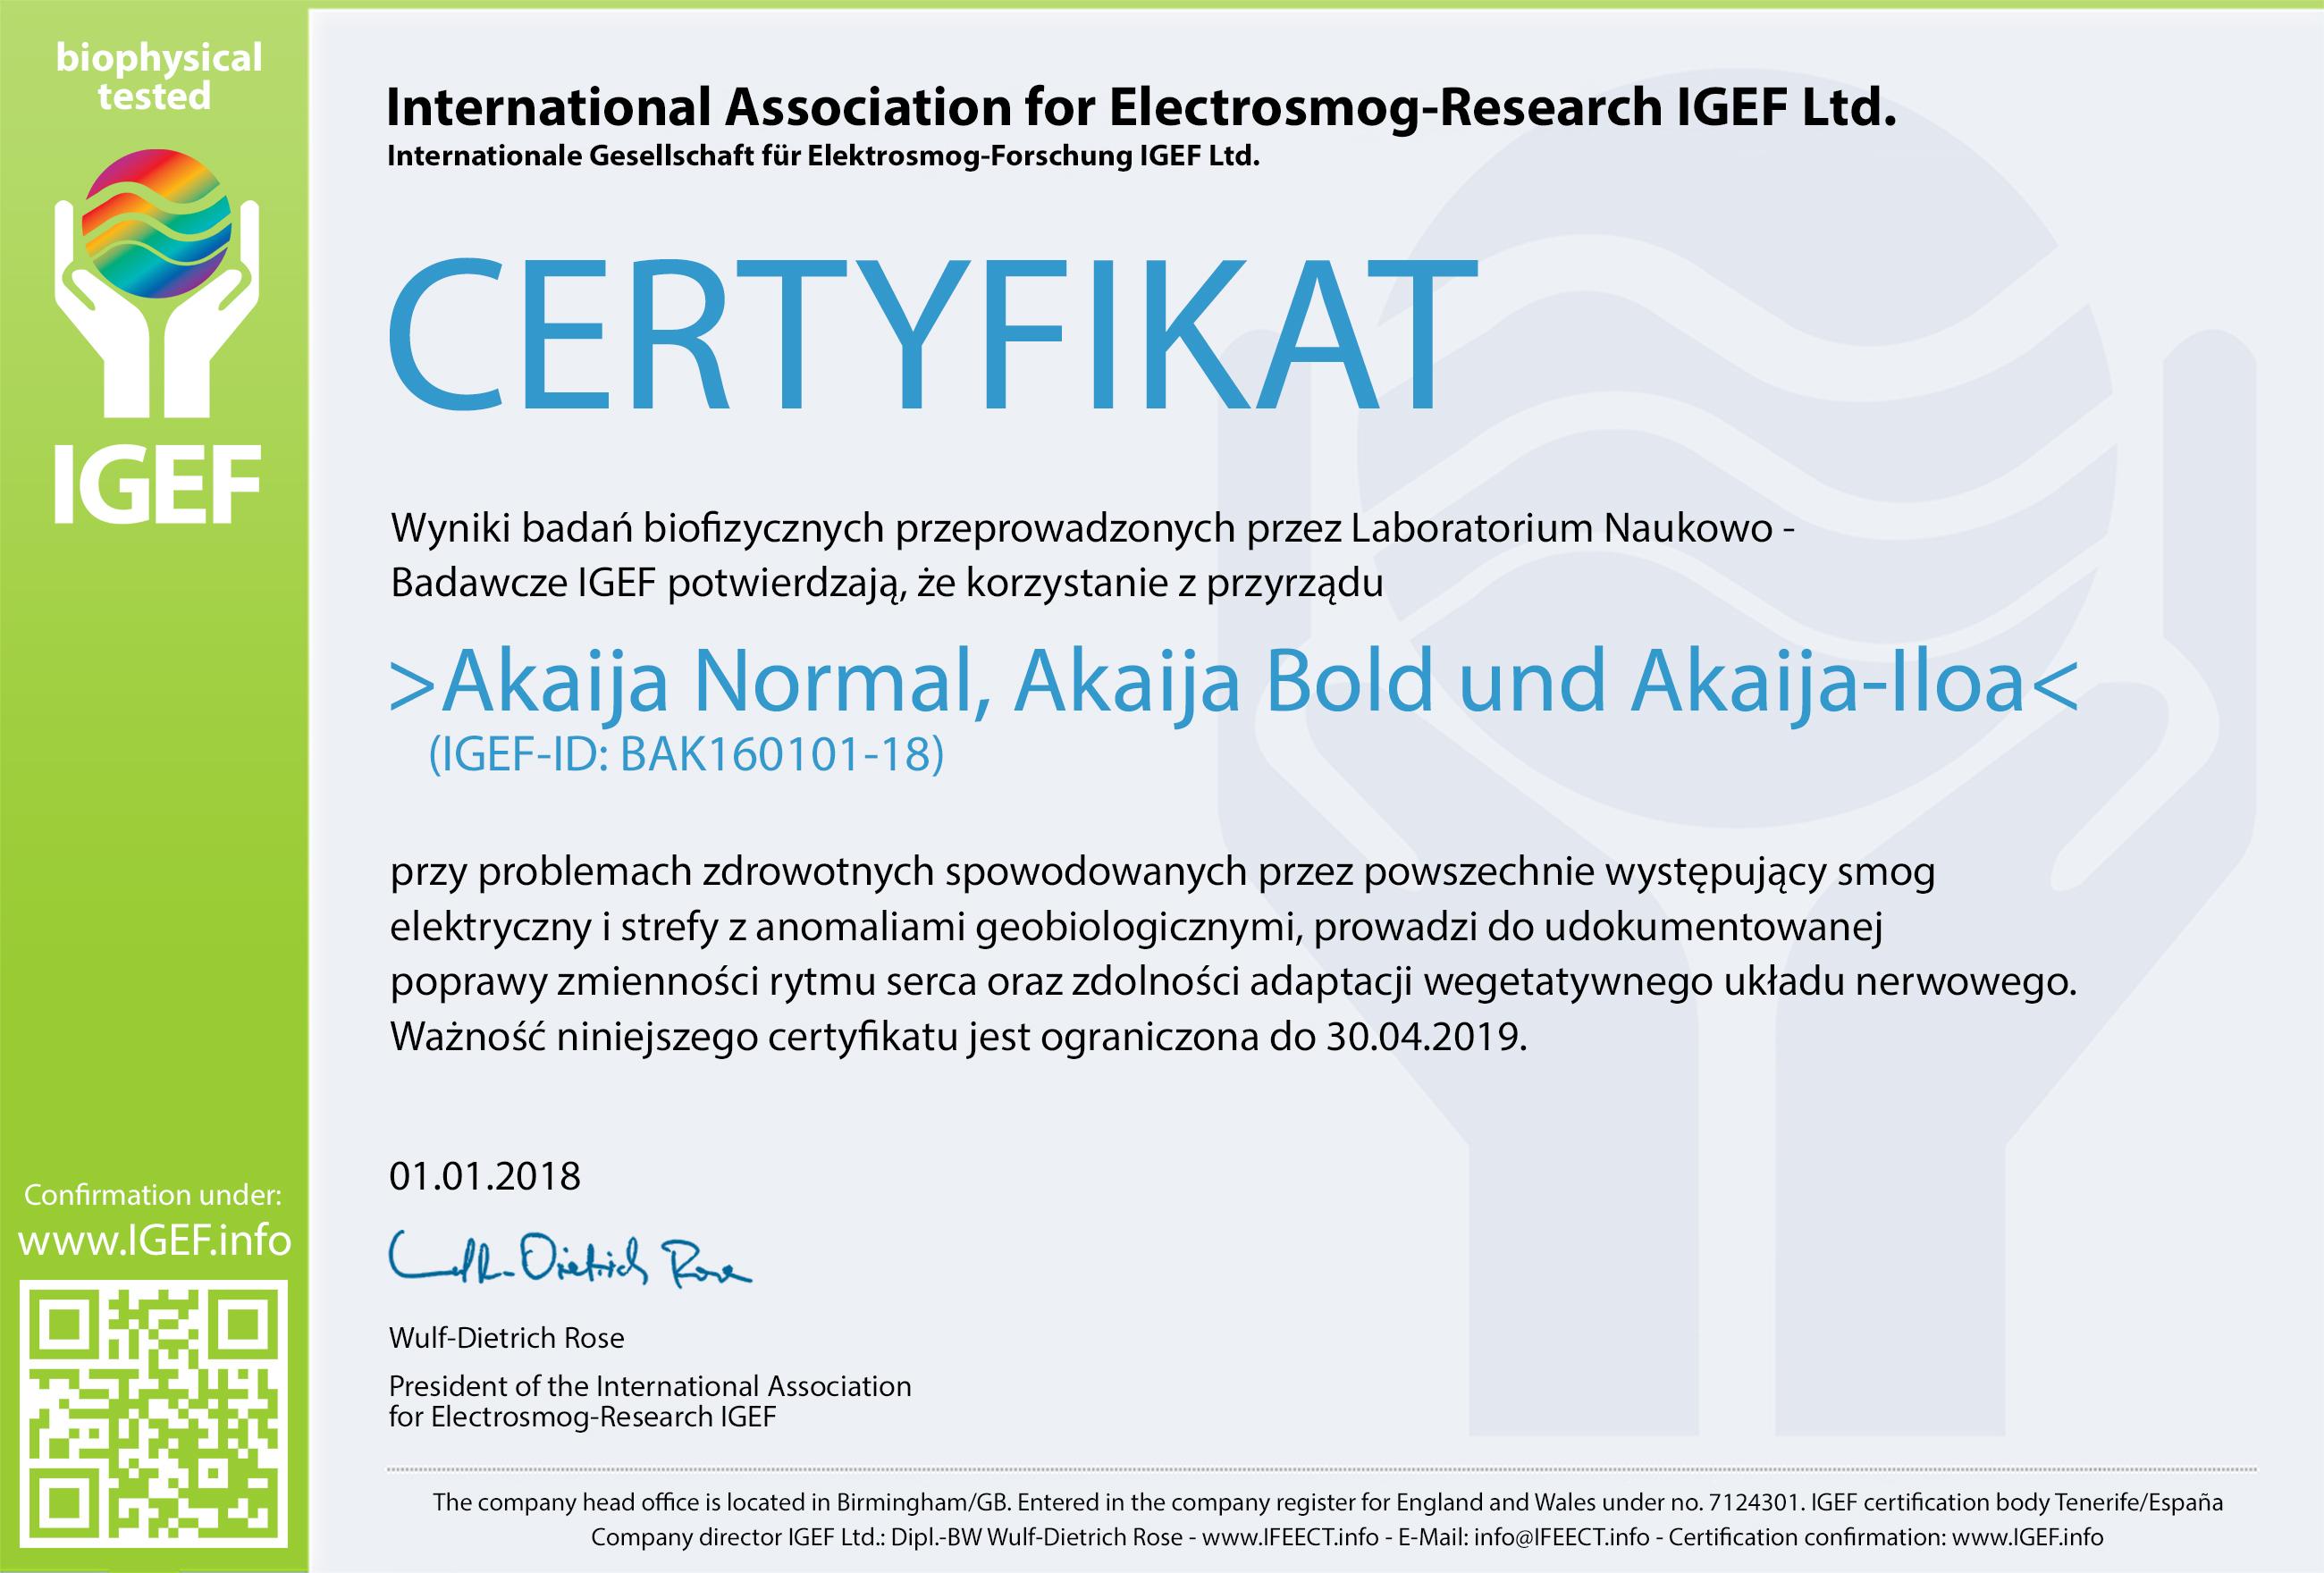 IGEF-Zertifikat-BAK-PL-18